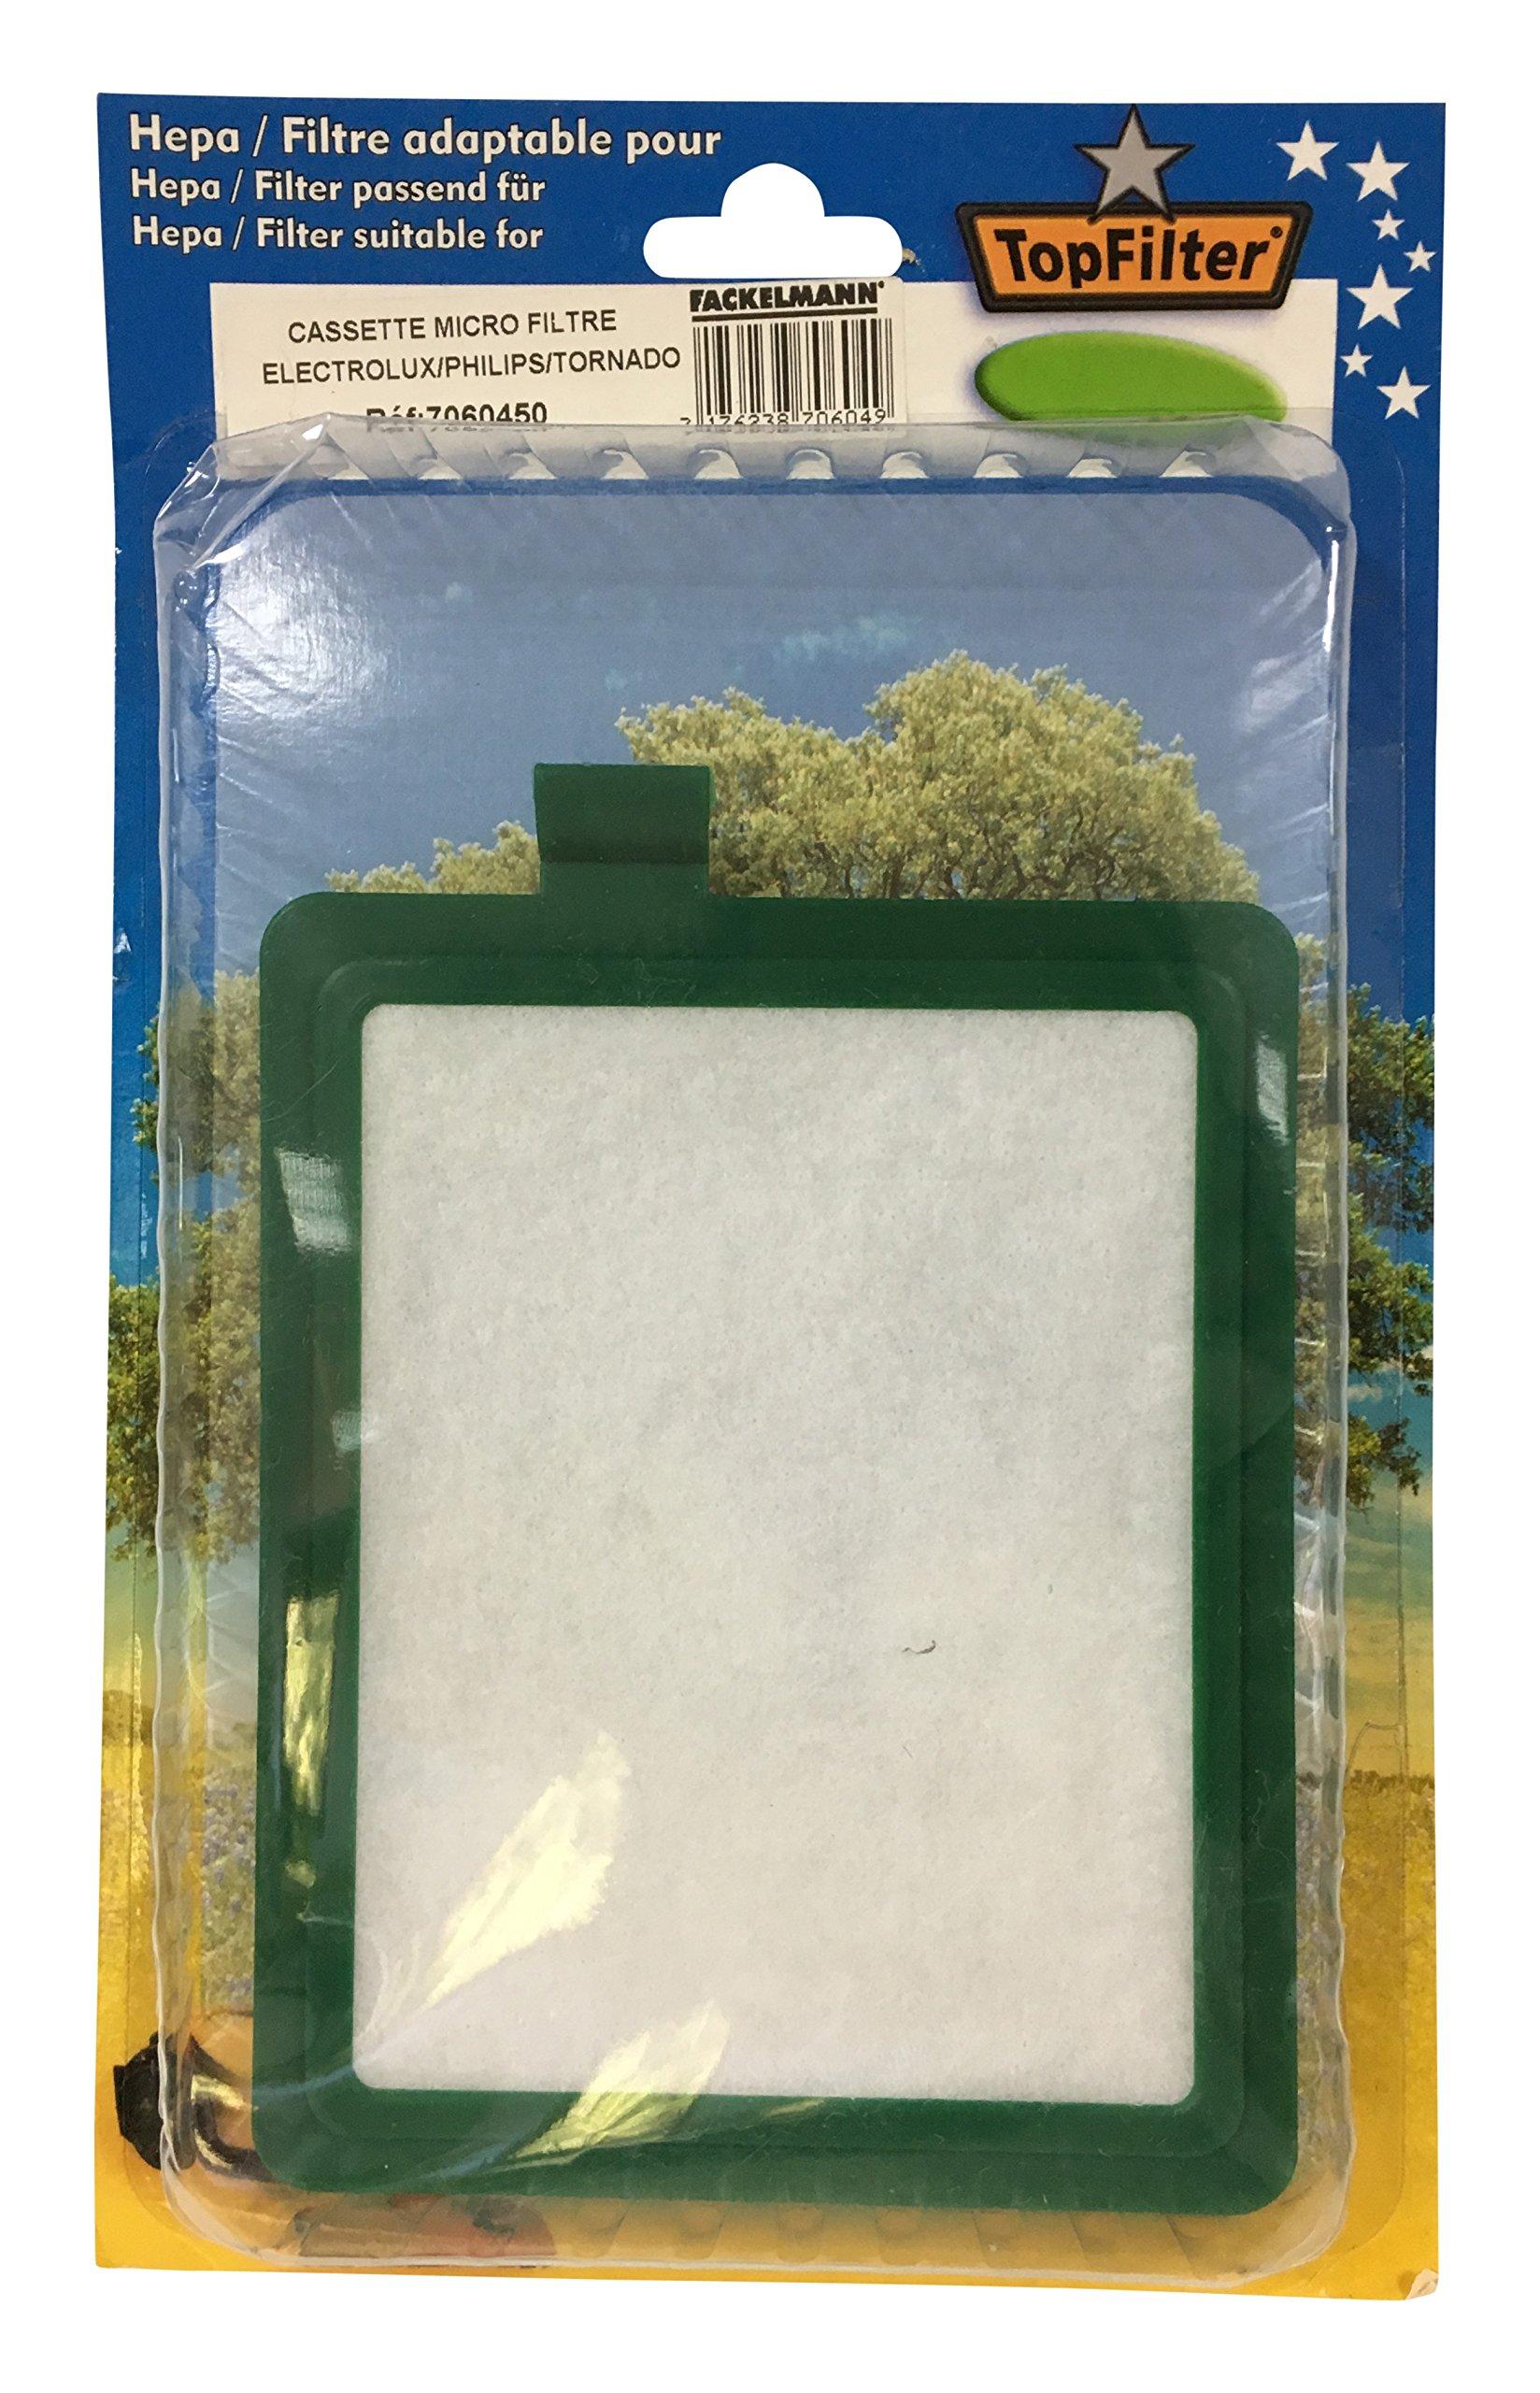 TopFilter 7060450 Aspirador escoba Filtro accesorio y suministro de vacío - Accesorio para aspiradora (Stick vacuum, Filtro,